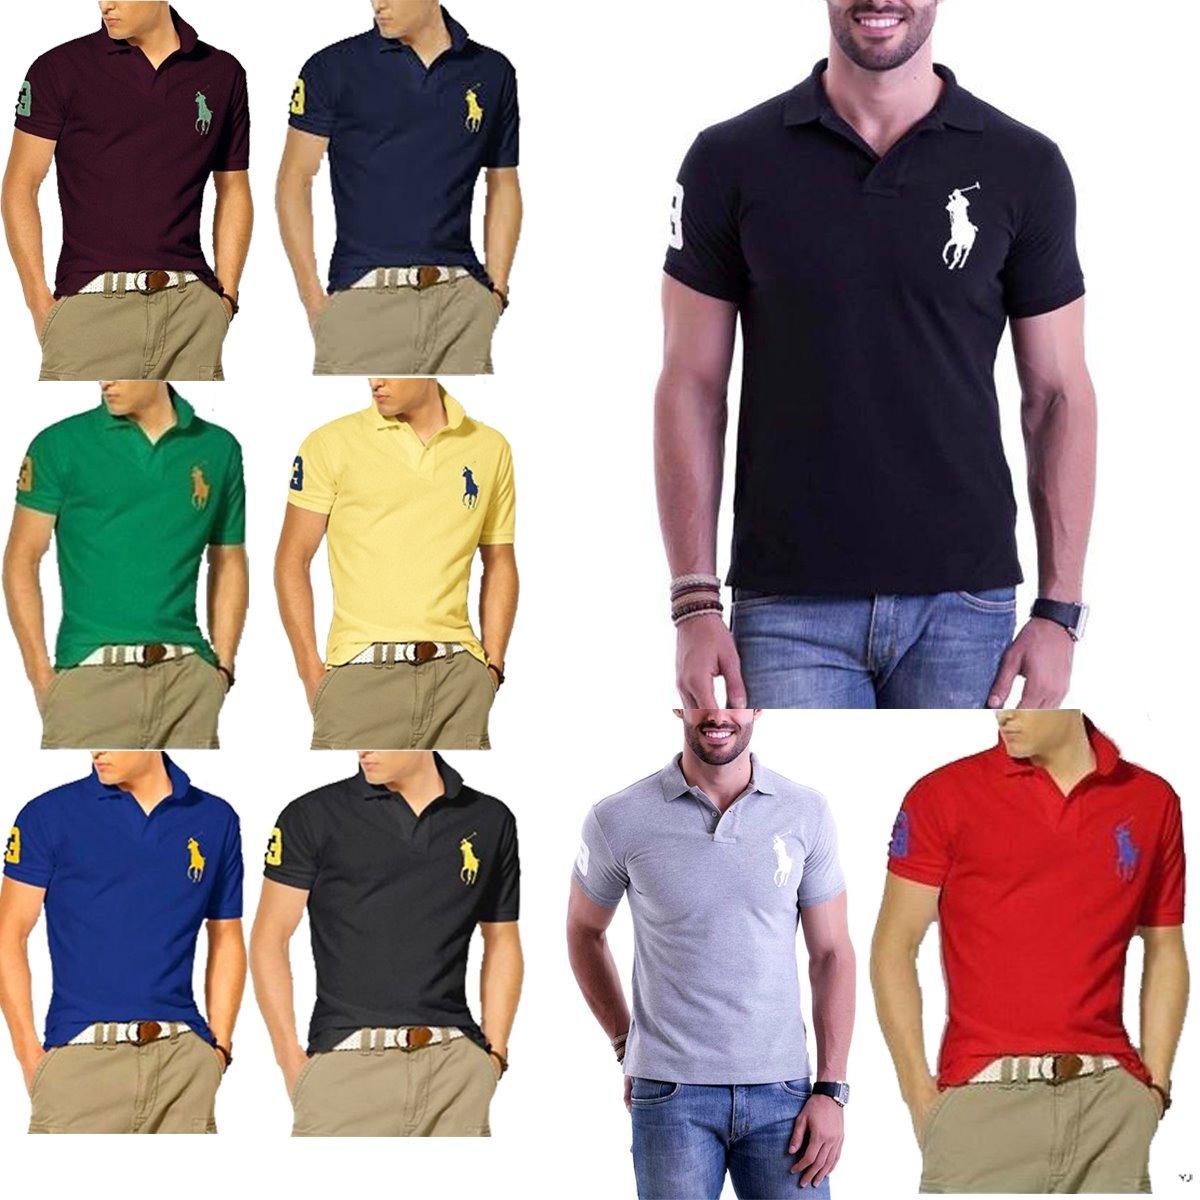 ... camisa polo masculina grandes marcas revenda oferta. Carregando zoom. ceb5026949759